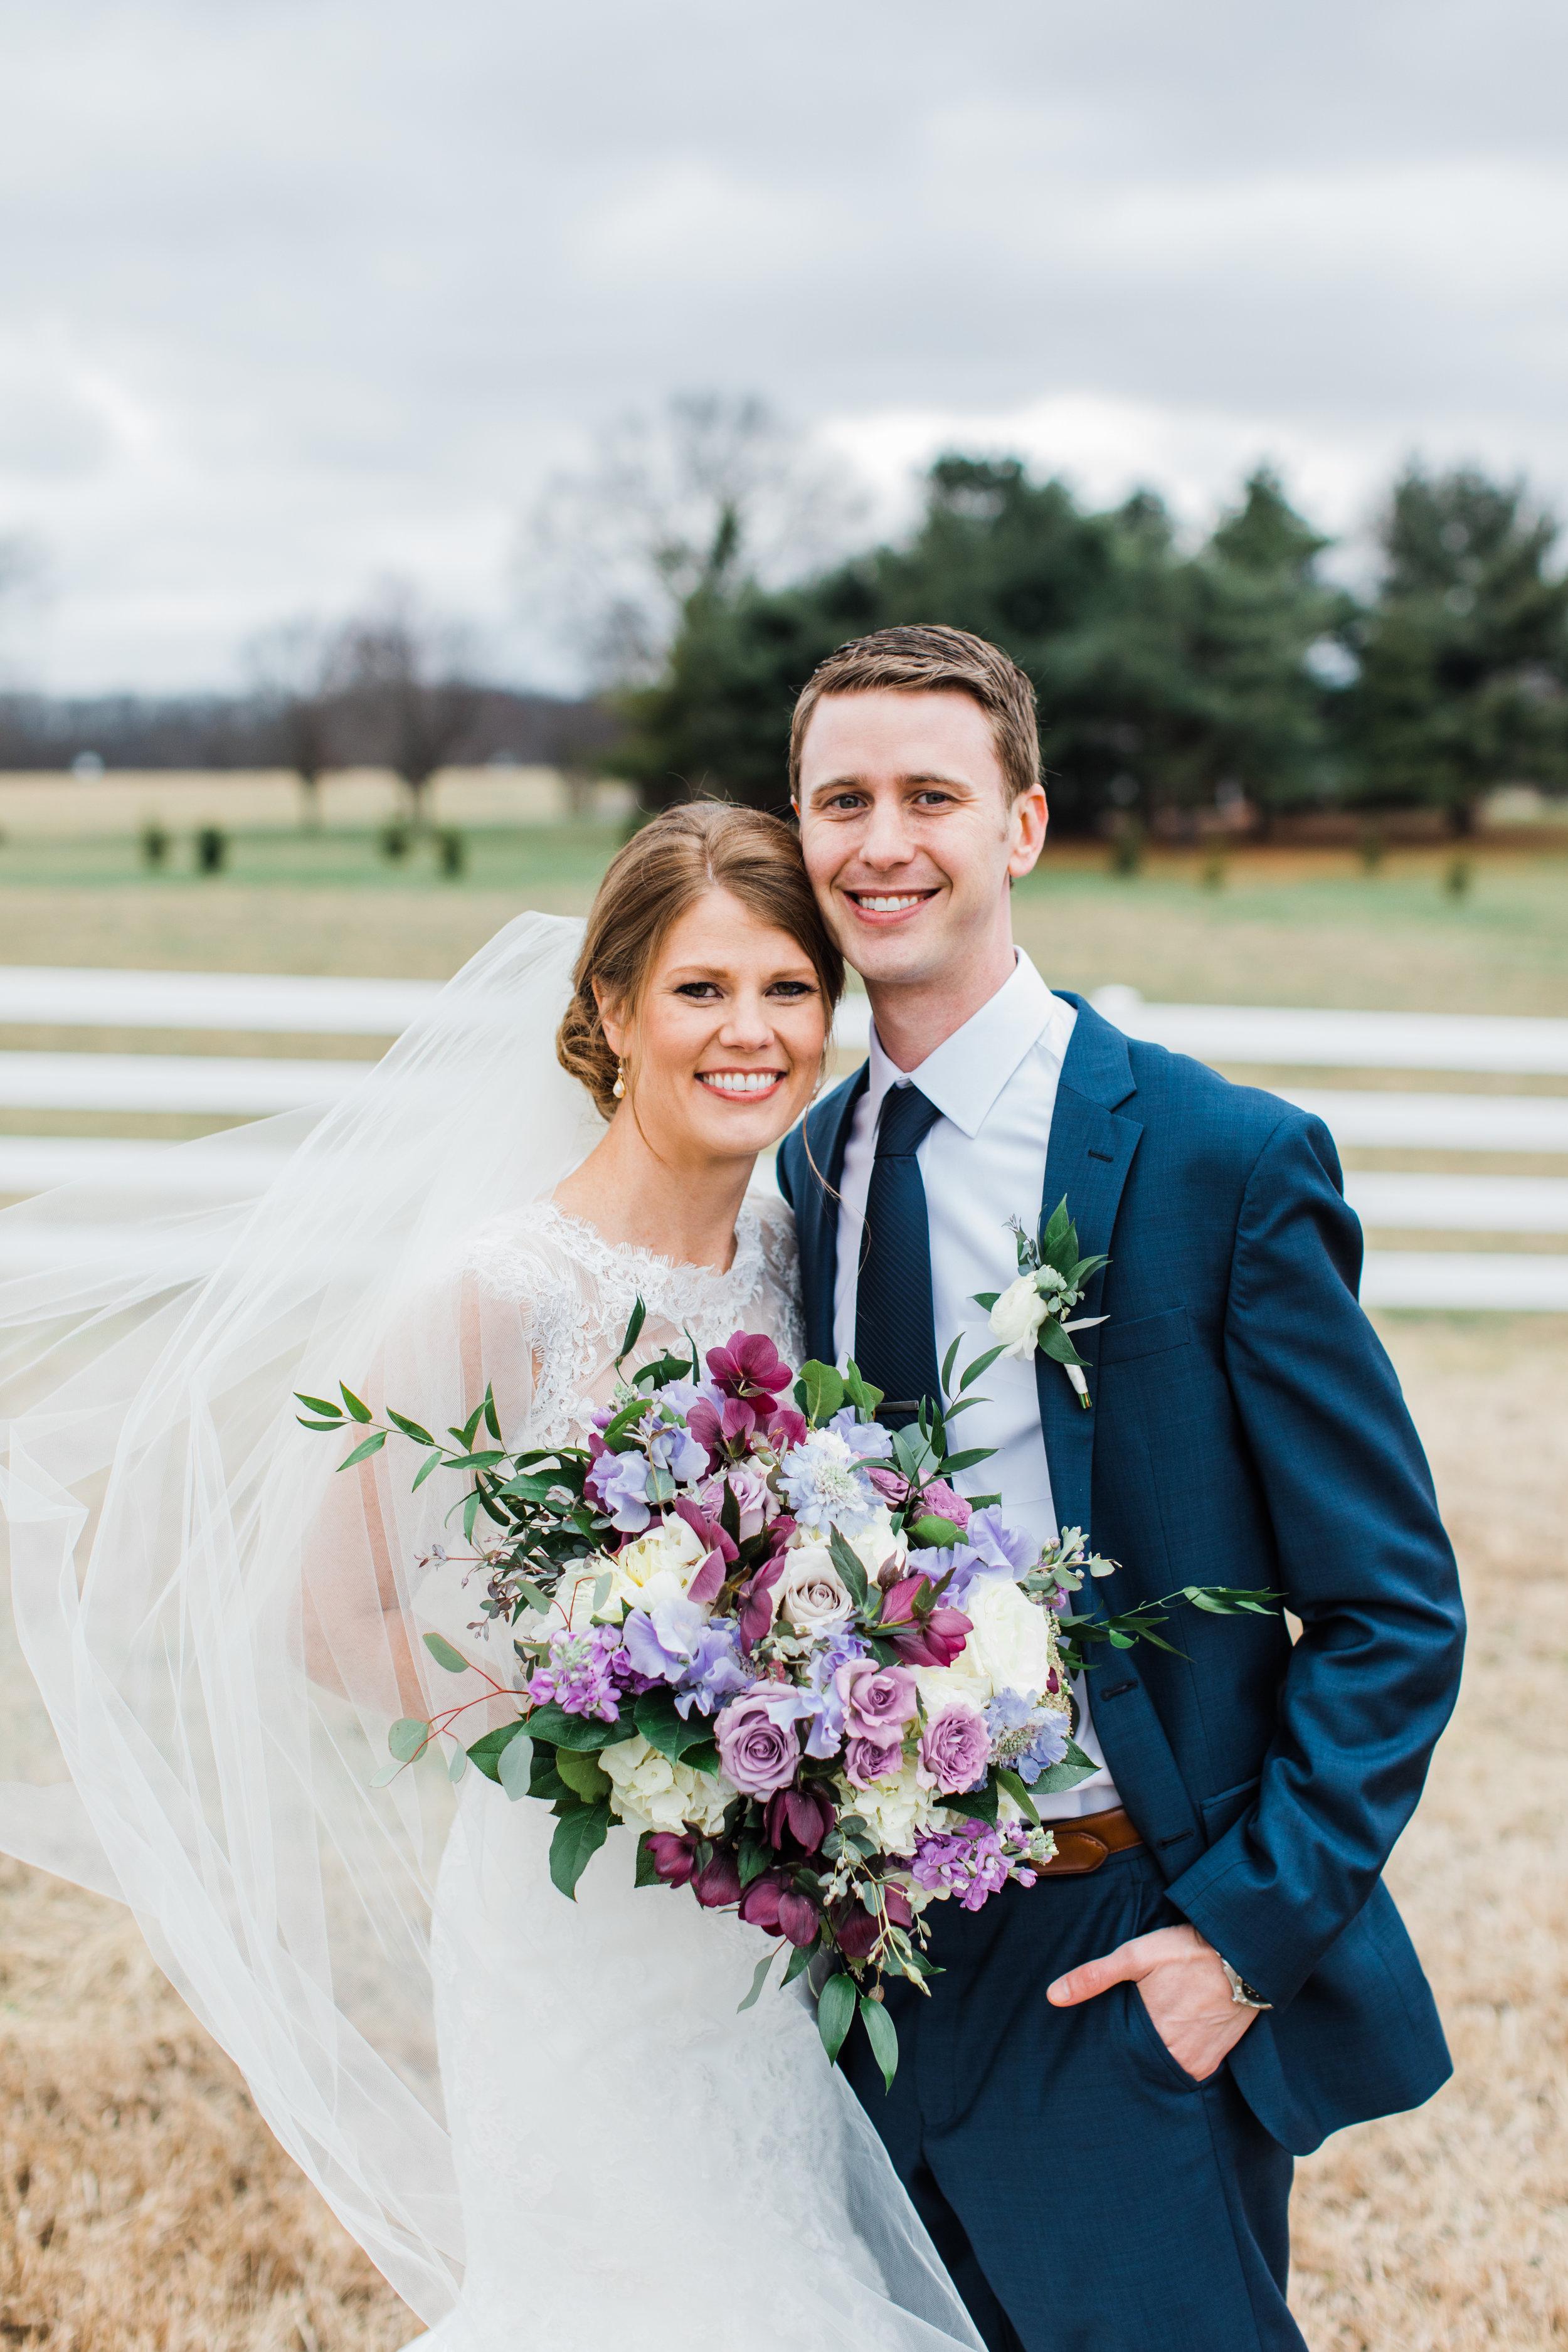 JACOBI WEDDING - MARISSA CRIBBS PHOTOGRAPHY-228.jpg